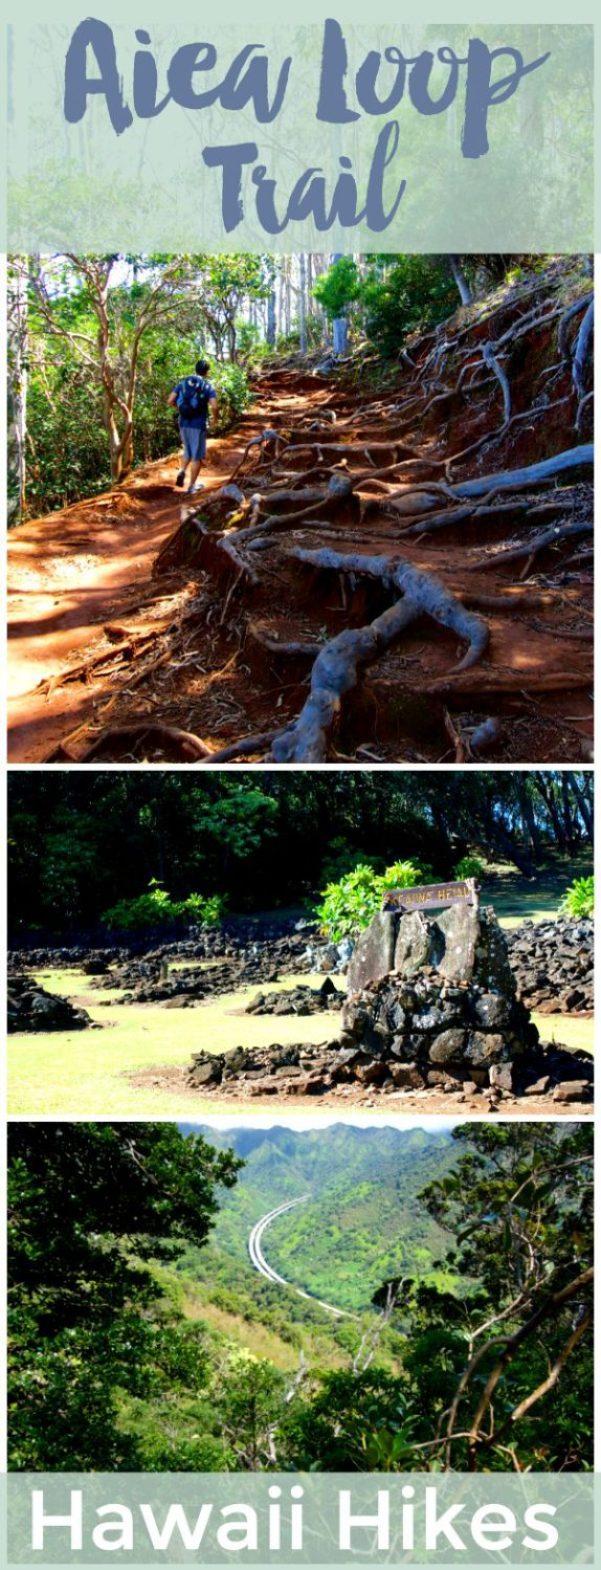 Tips for hiking the Aiea Loop Trail on Oahu | Hawaii Hikes